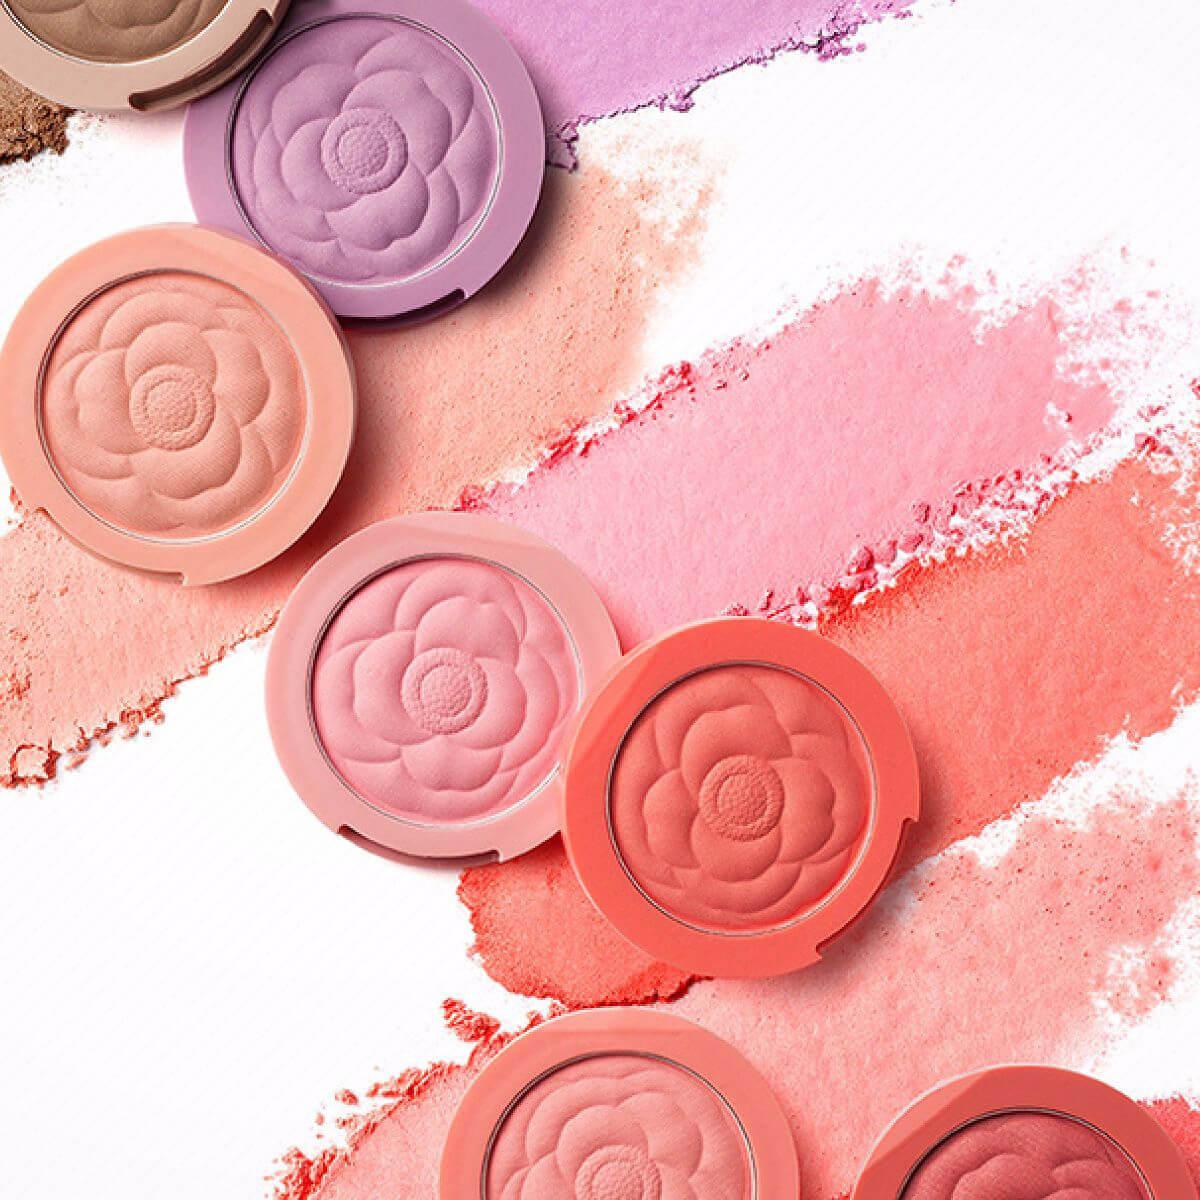 Mamonde Flower Pop Blusher - Bici Cosmetics